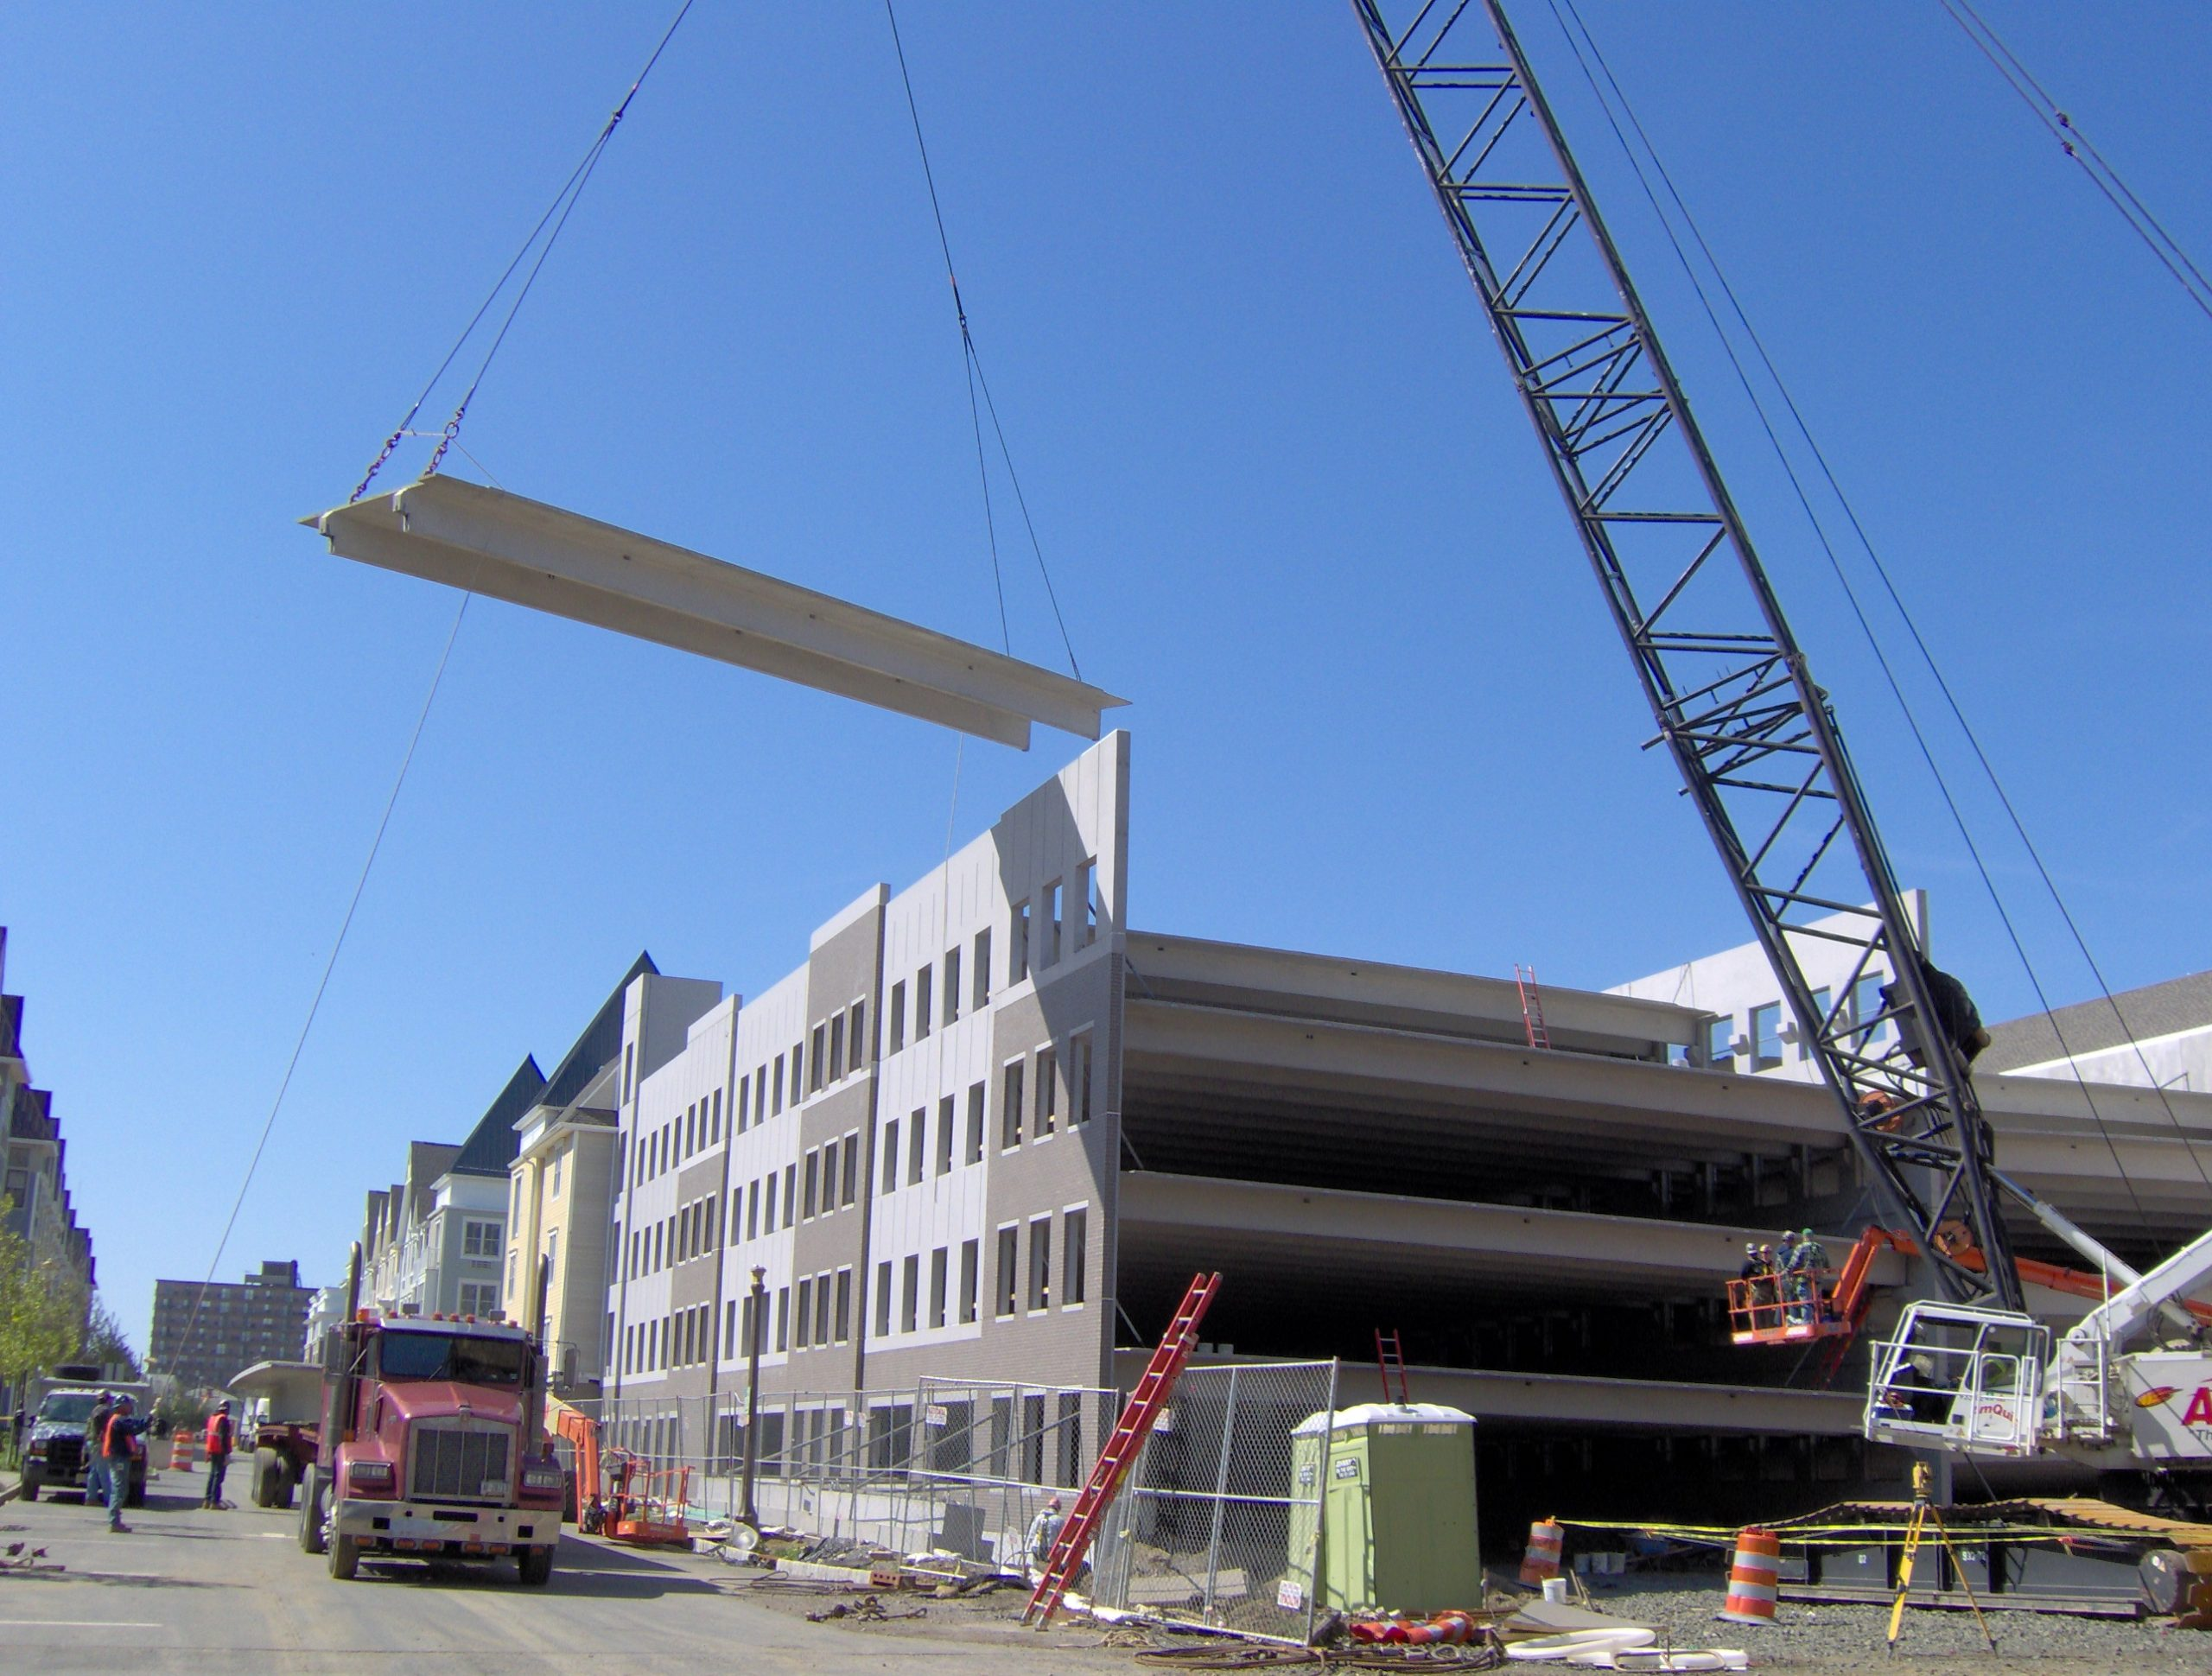 Pier Village building being constructed using precast concrete